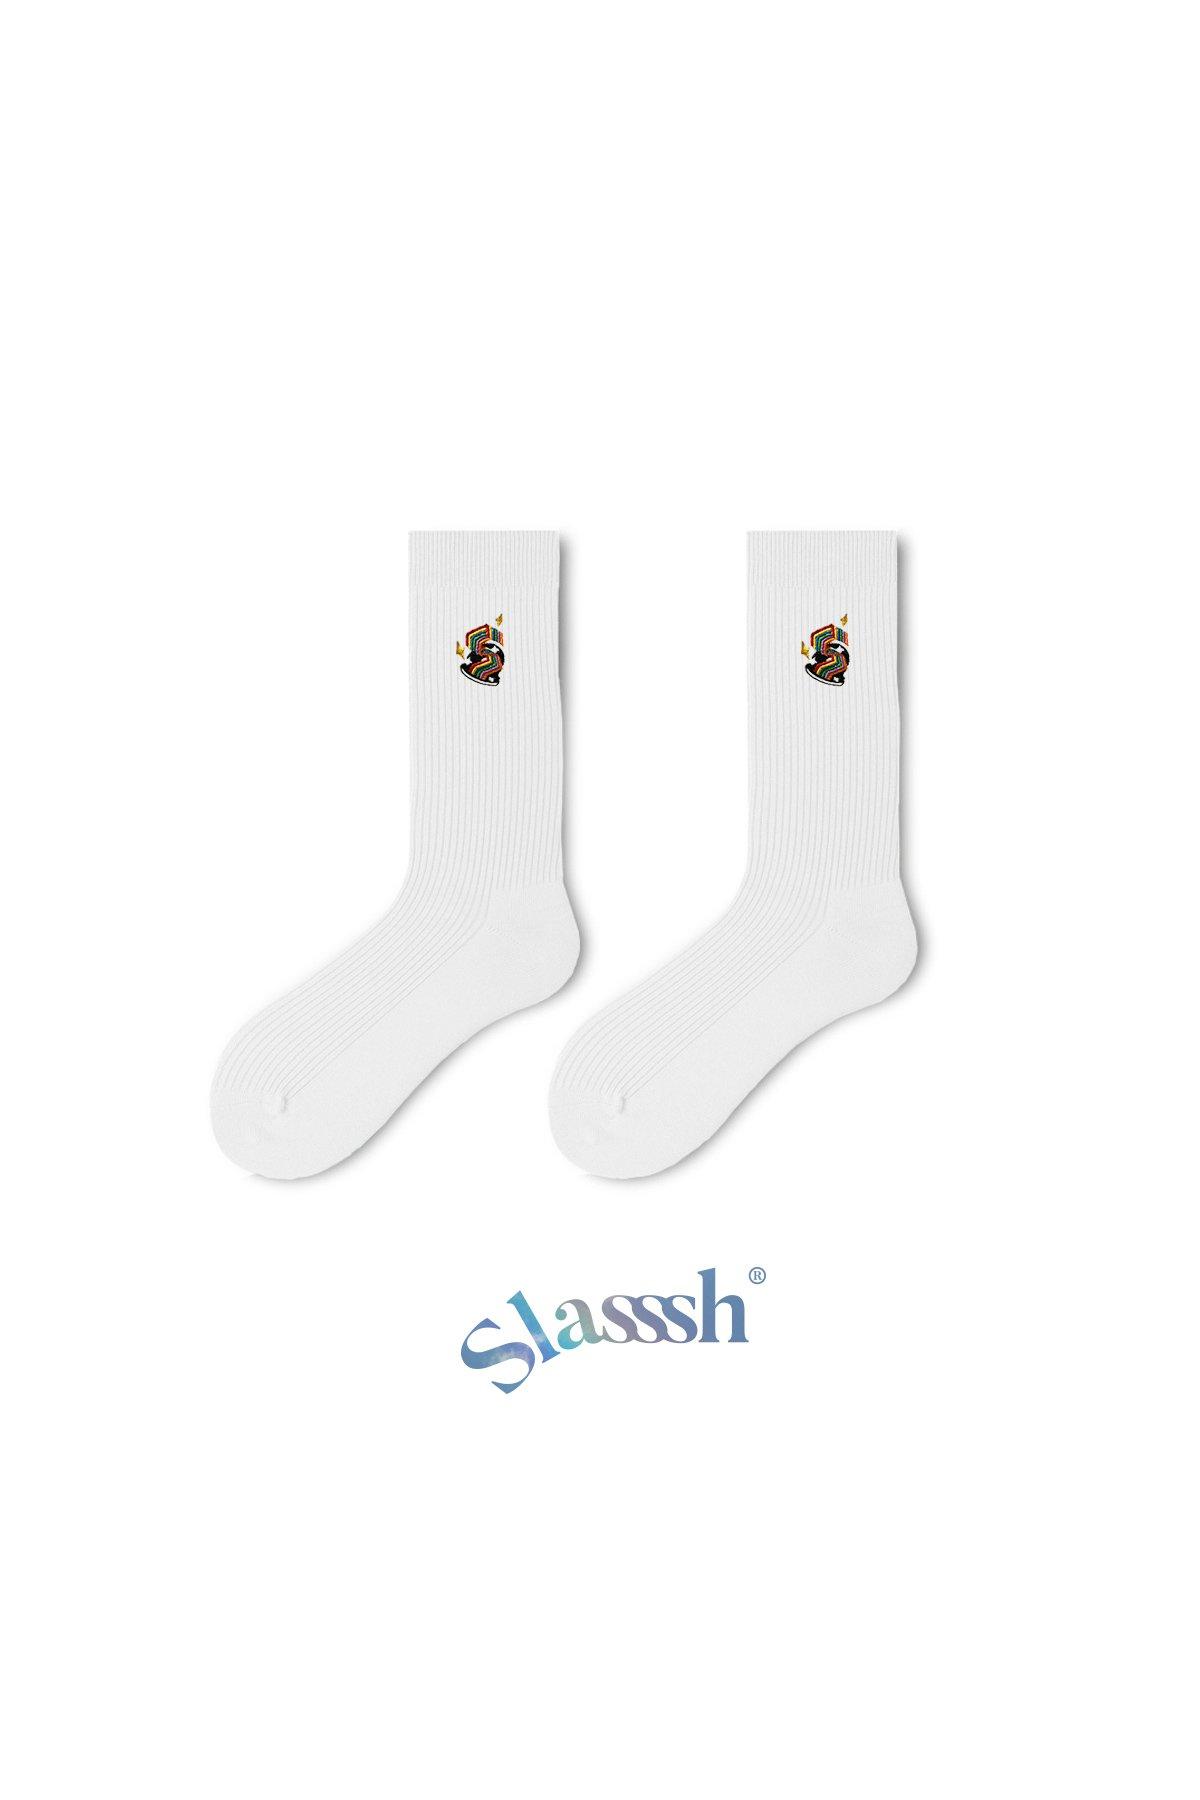 Image of Pride Socks